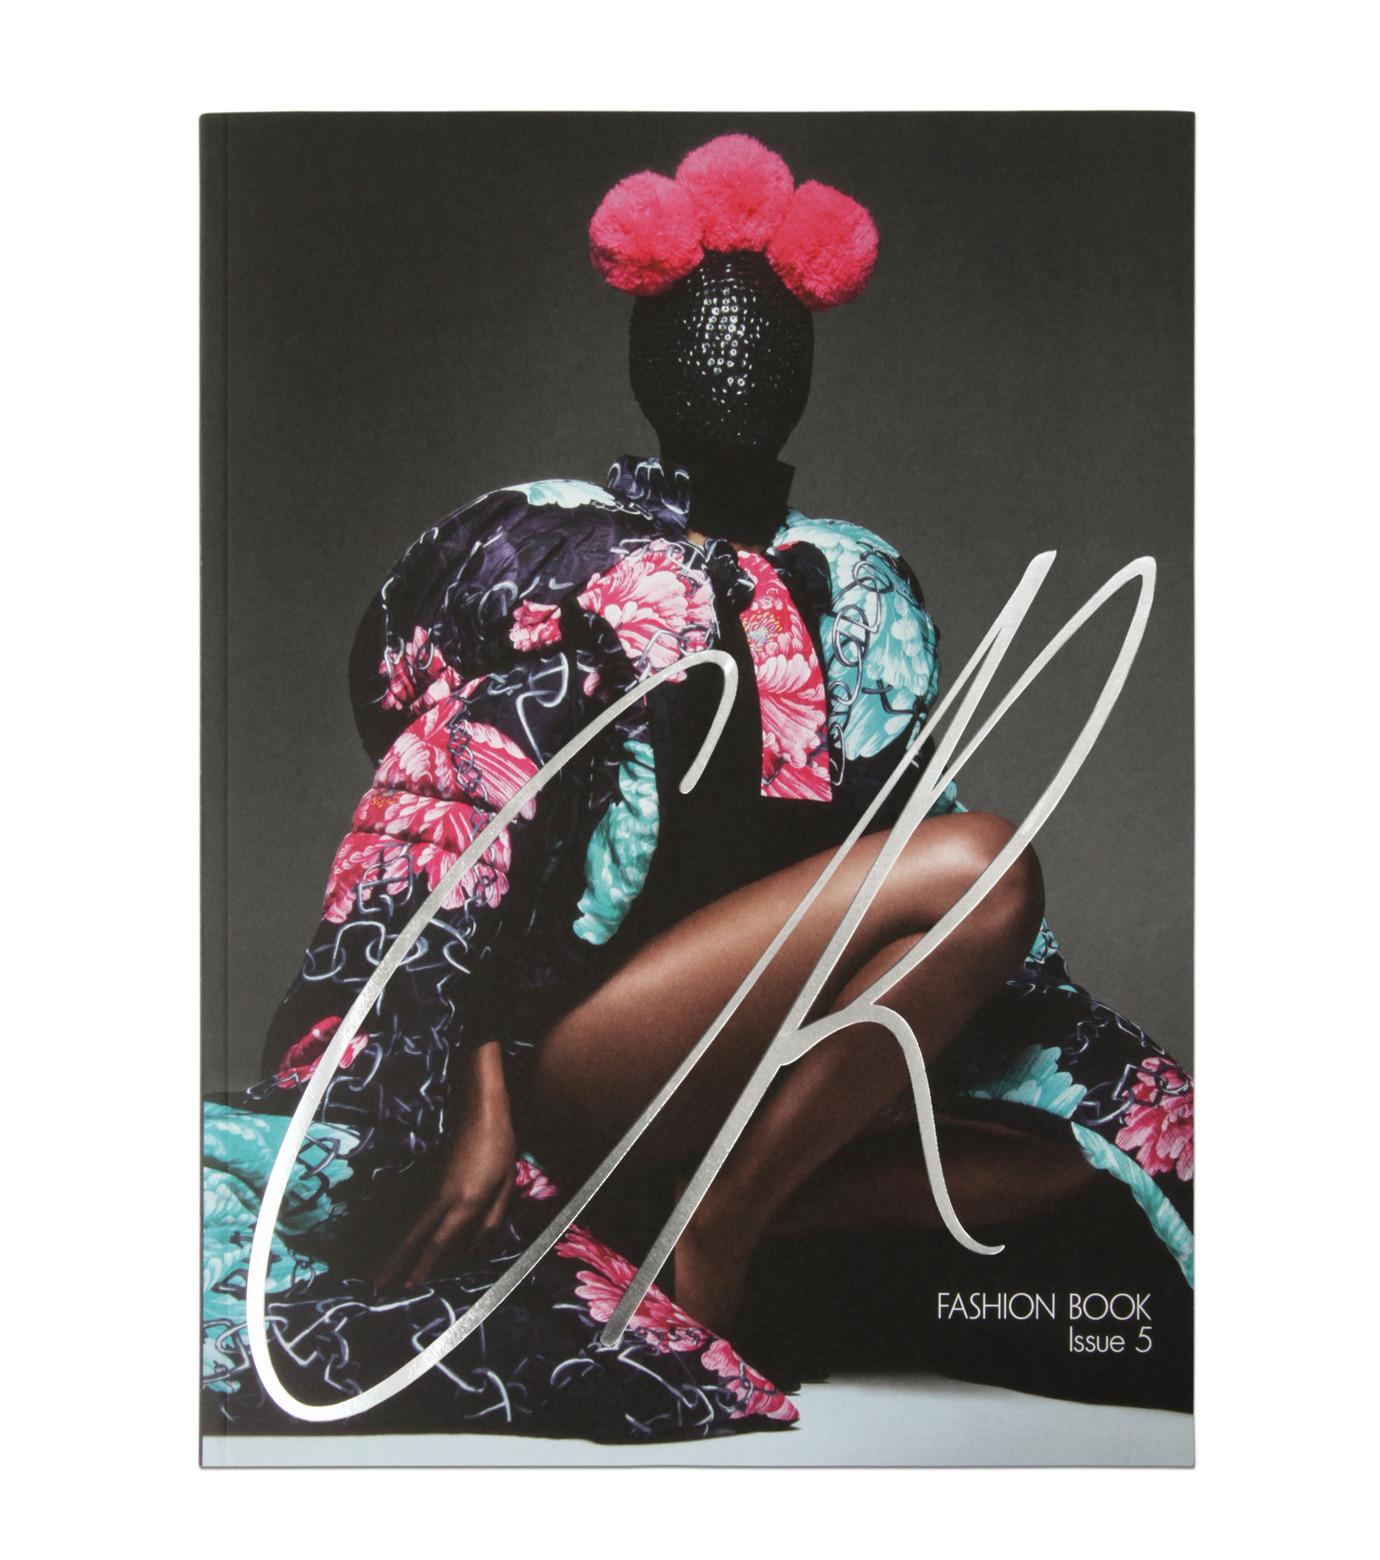 Magazine(マガジン)のCR FASHION BOOK (#5)-NONE-CR2010X14005-0 拡大詳細画像2